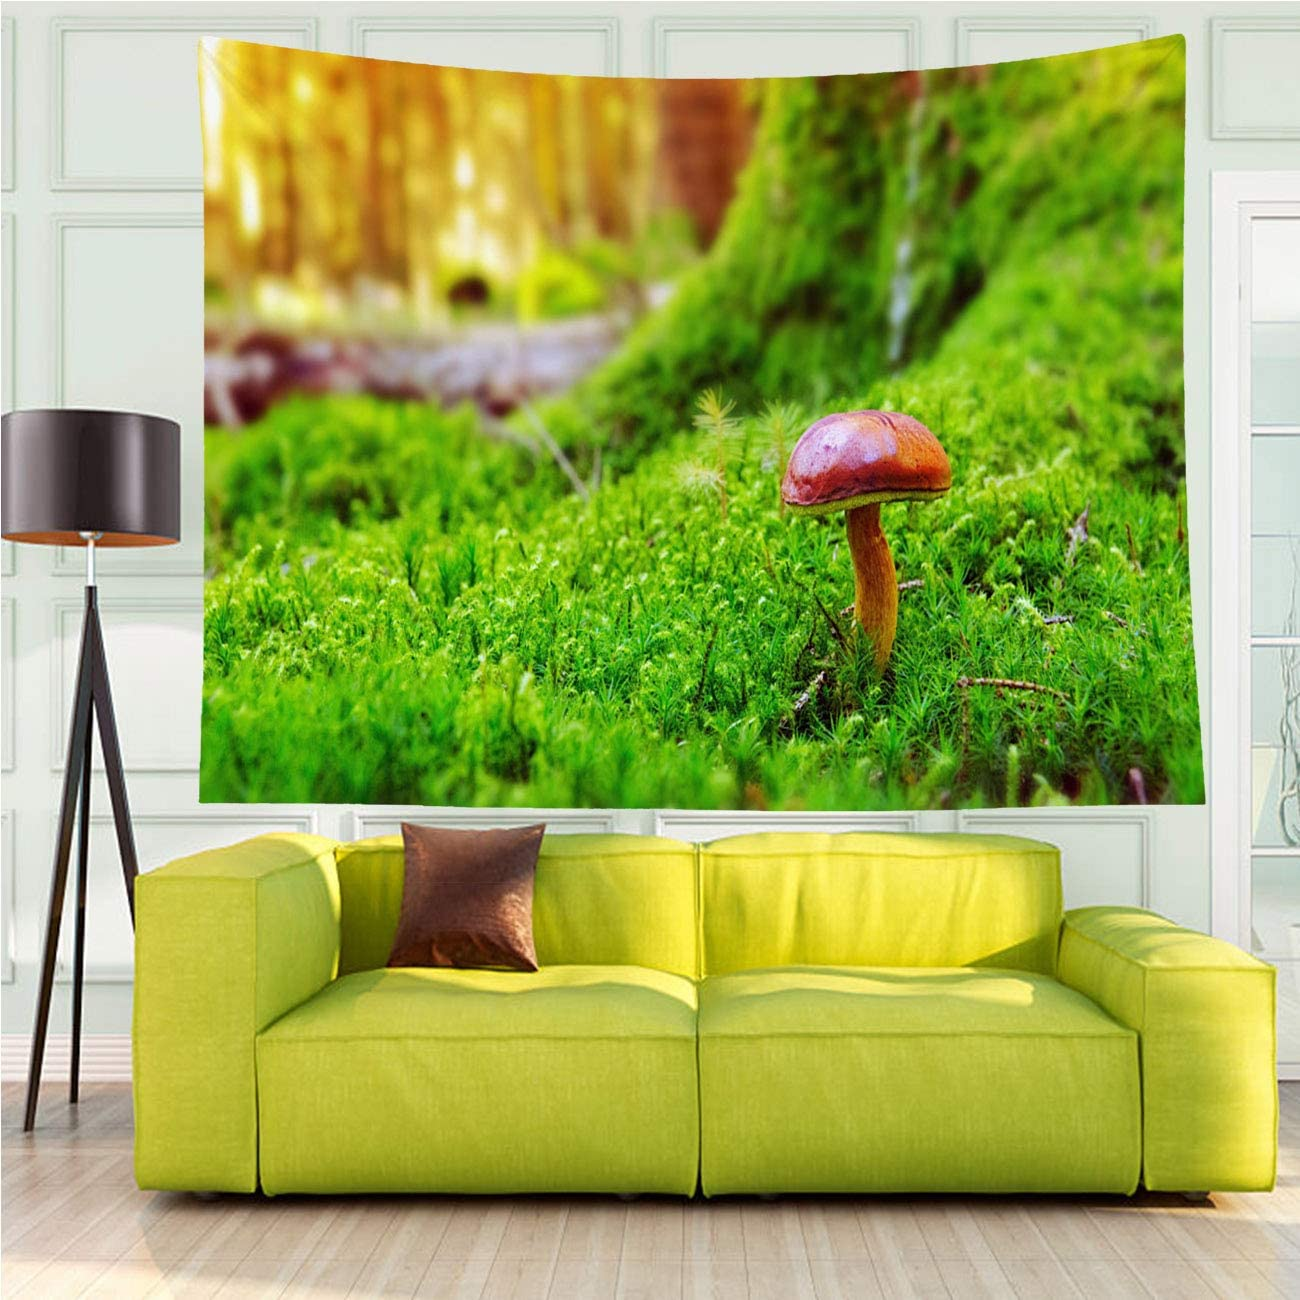 MinGz Tapestry Versatile,Mushroom in Green Moss,Tapestry for Living Room Bedroom Dorm Home Decor,80x60 in